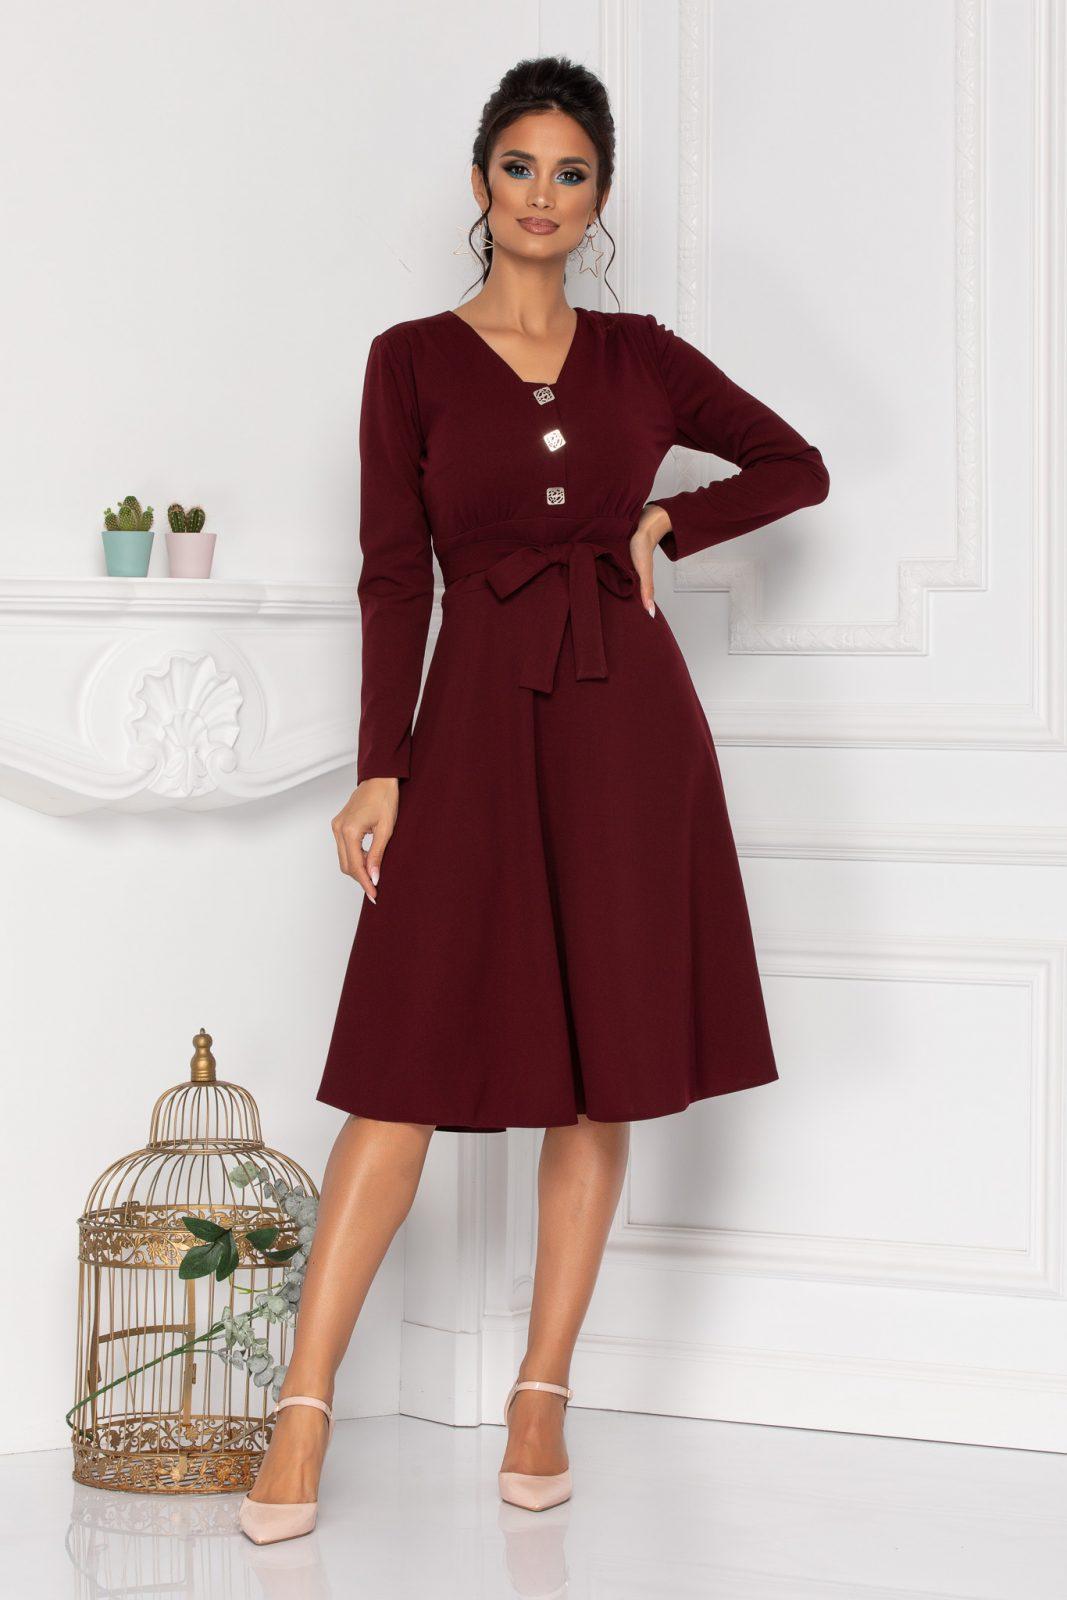 Moze Thalisa Burgundy Dress